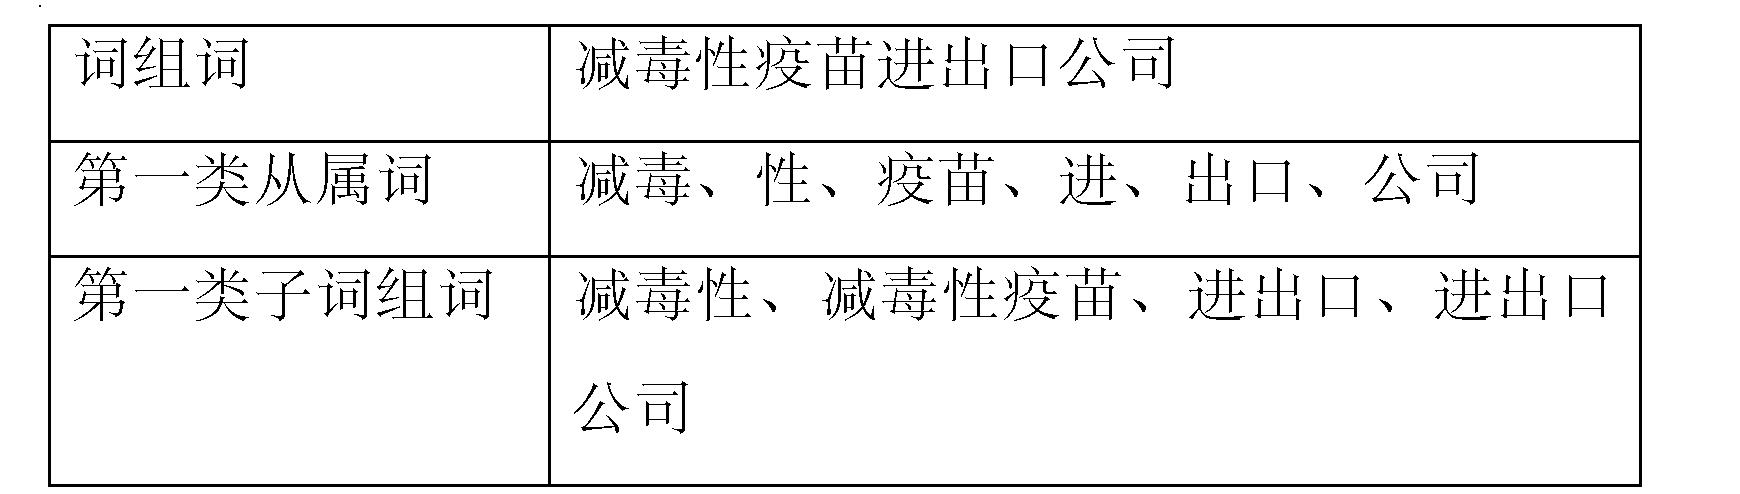 Figure CN103324626AD00112